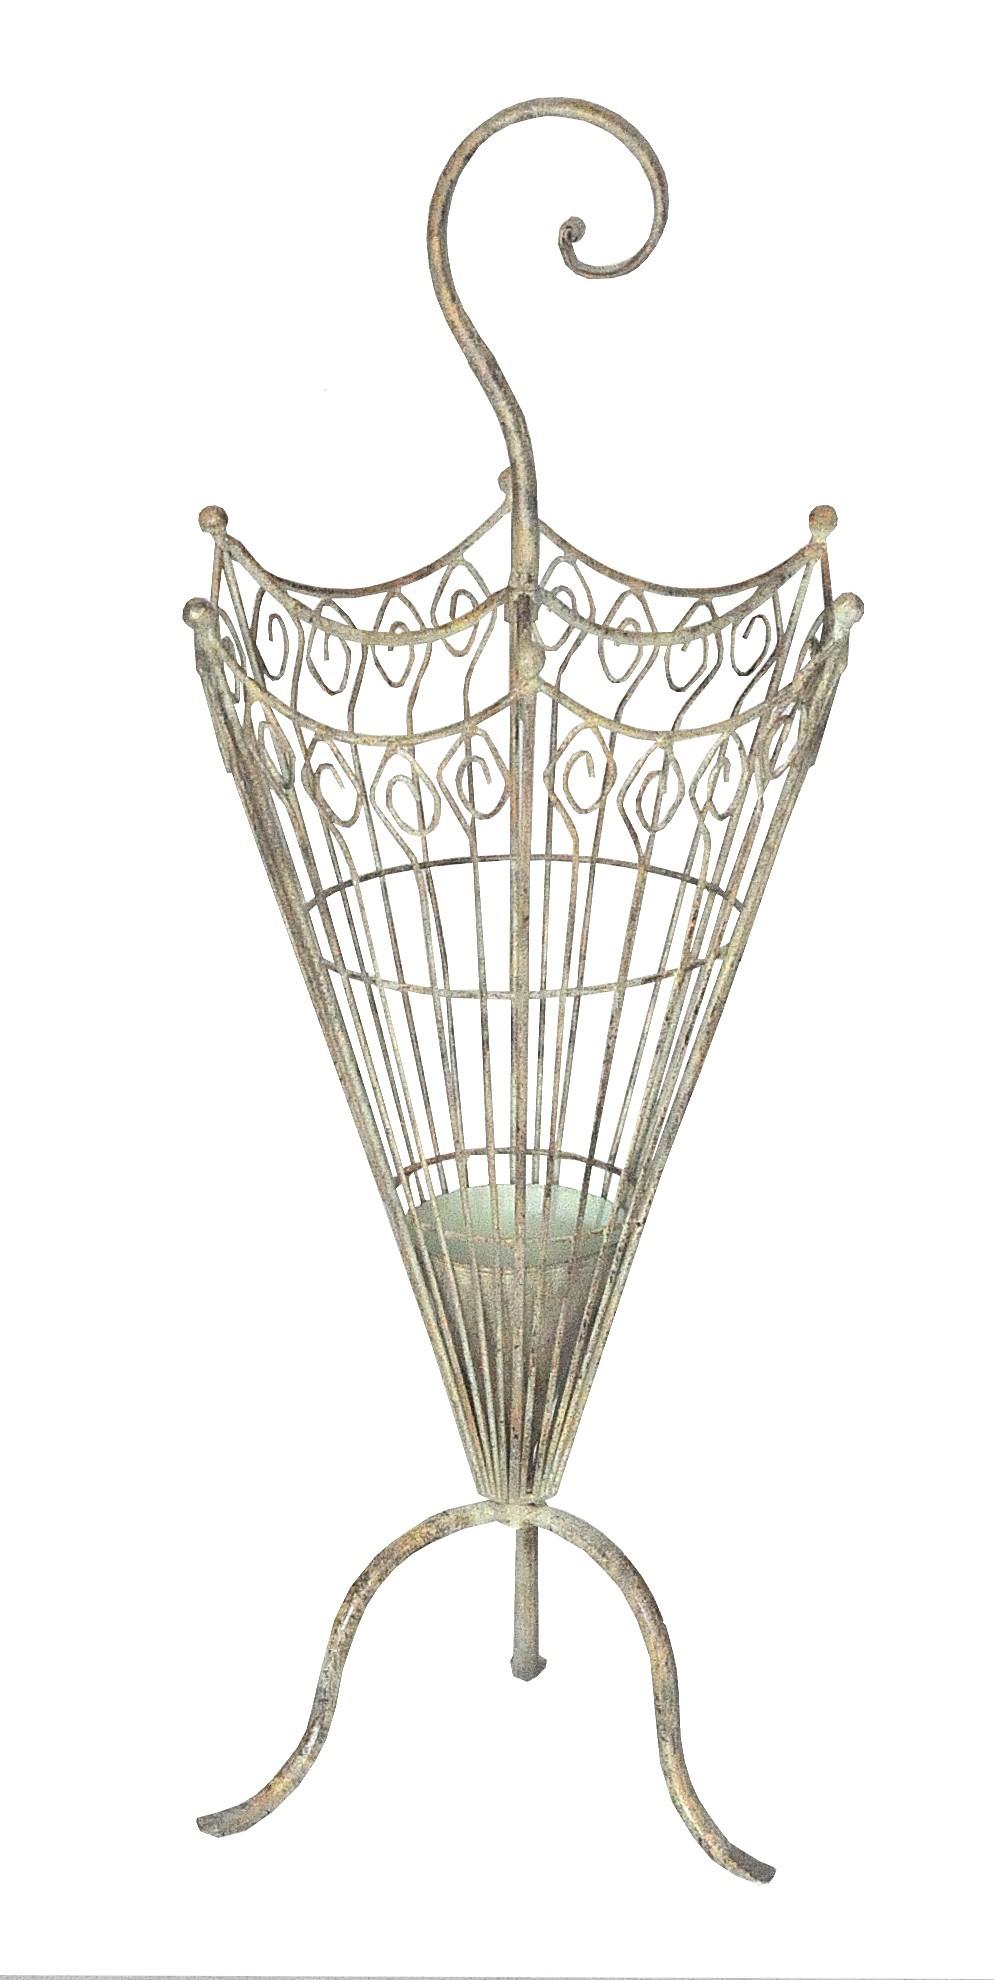 Porte parapluie fer forg demeure et jardin for Decoration porte fer forge